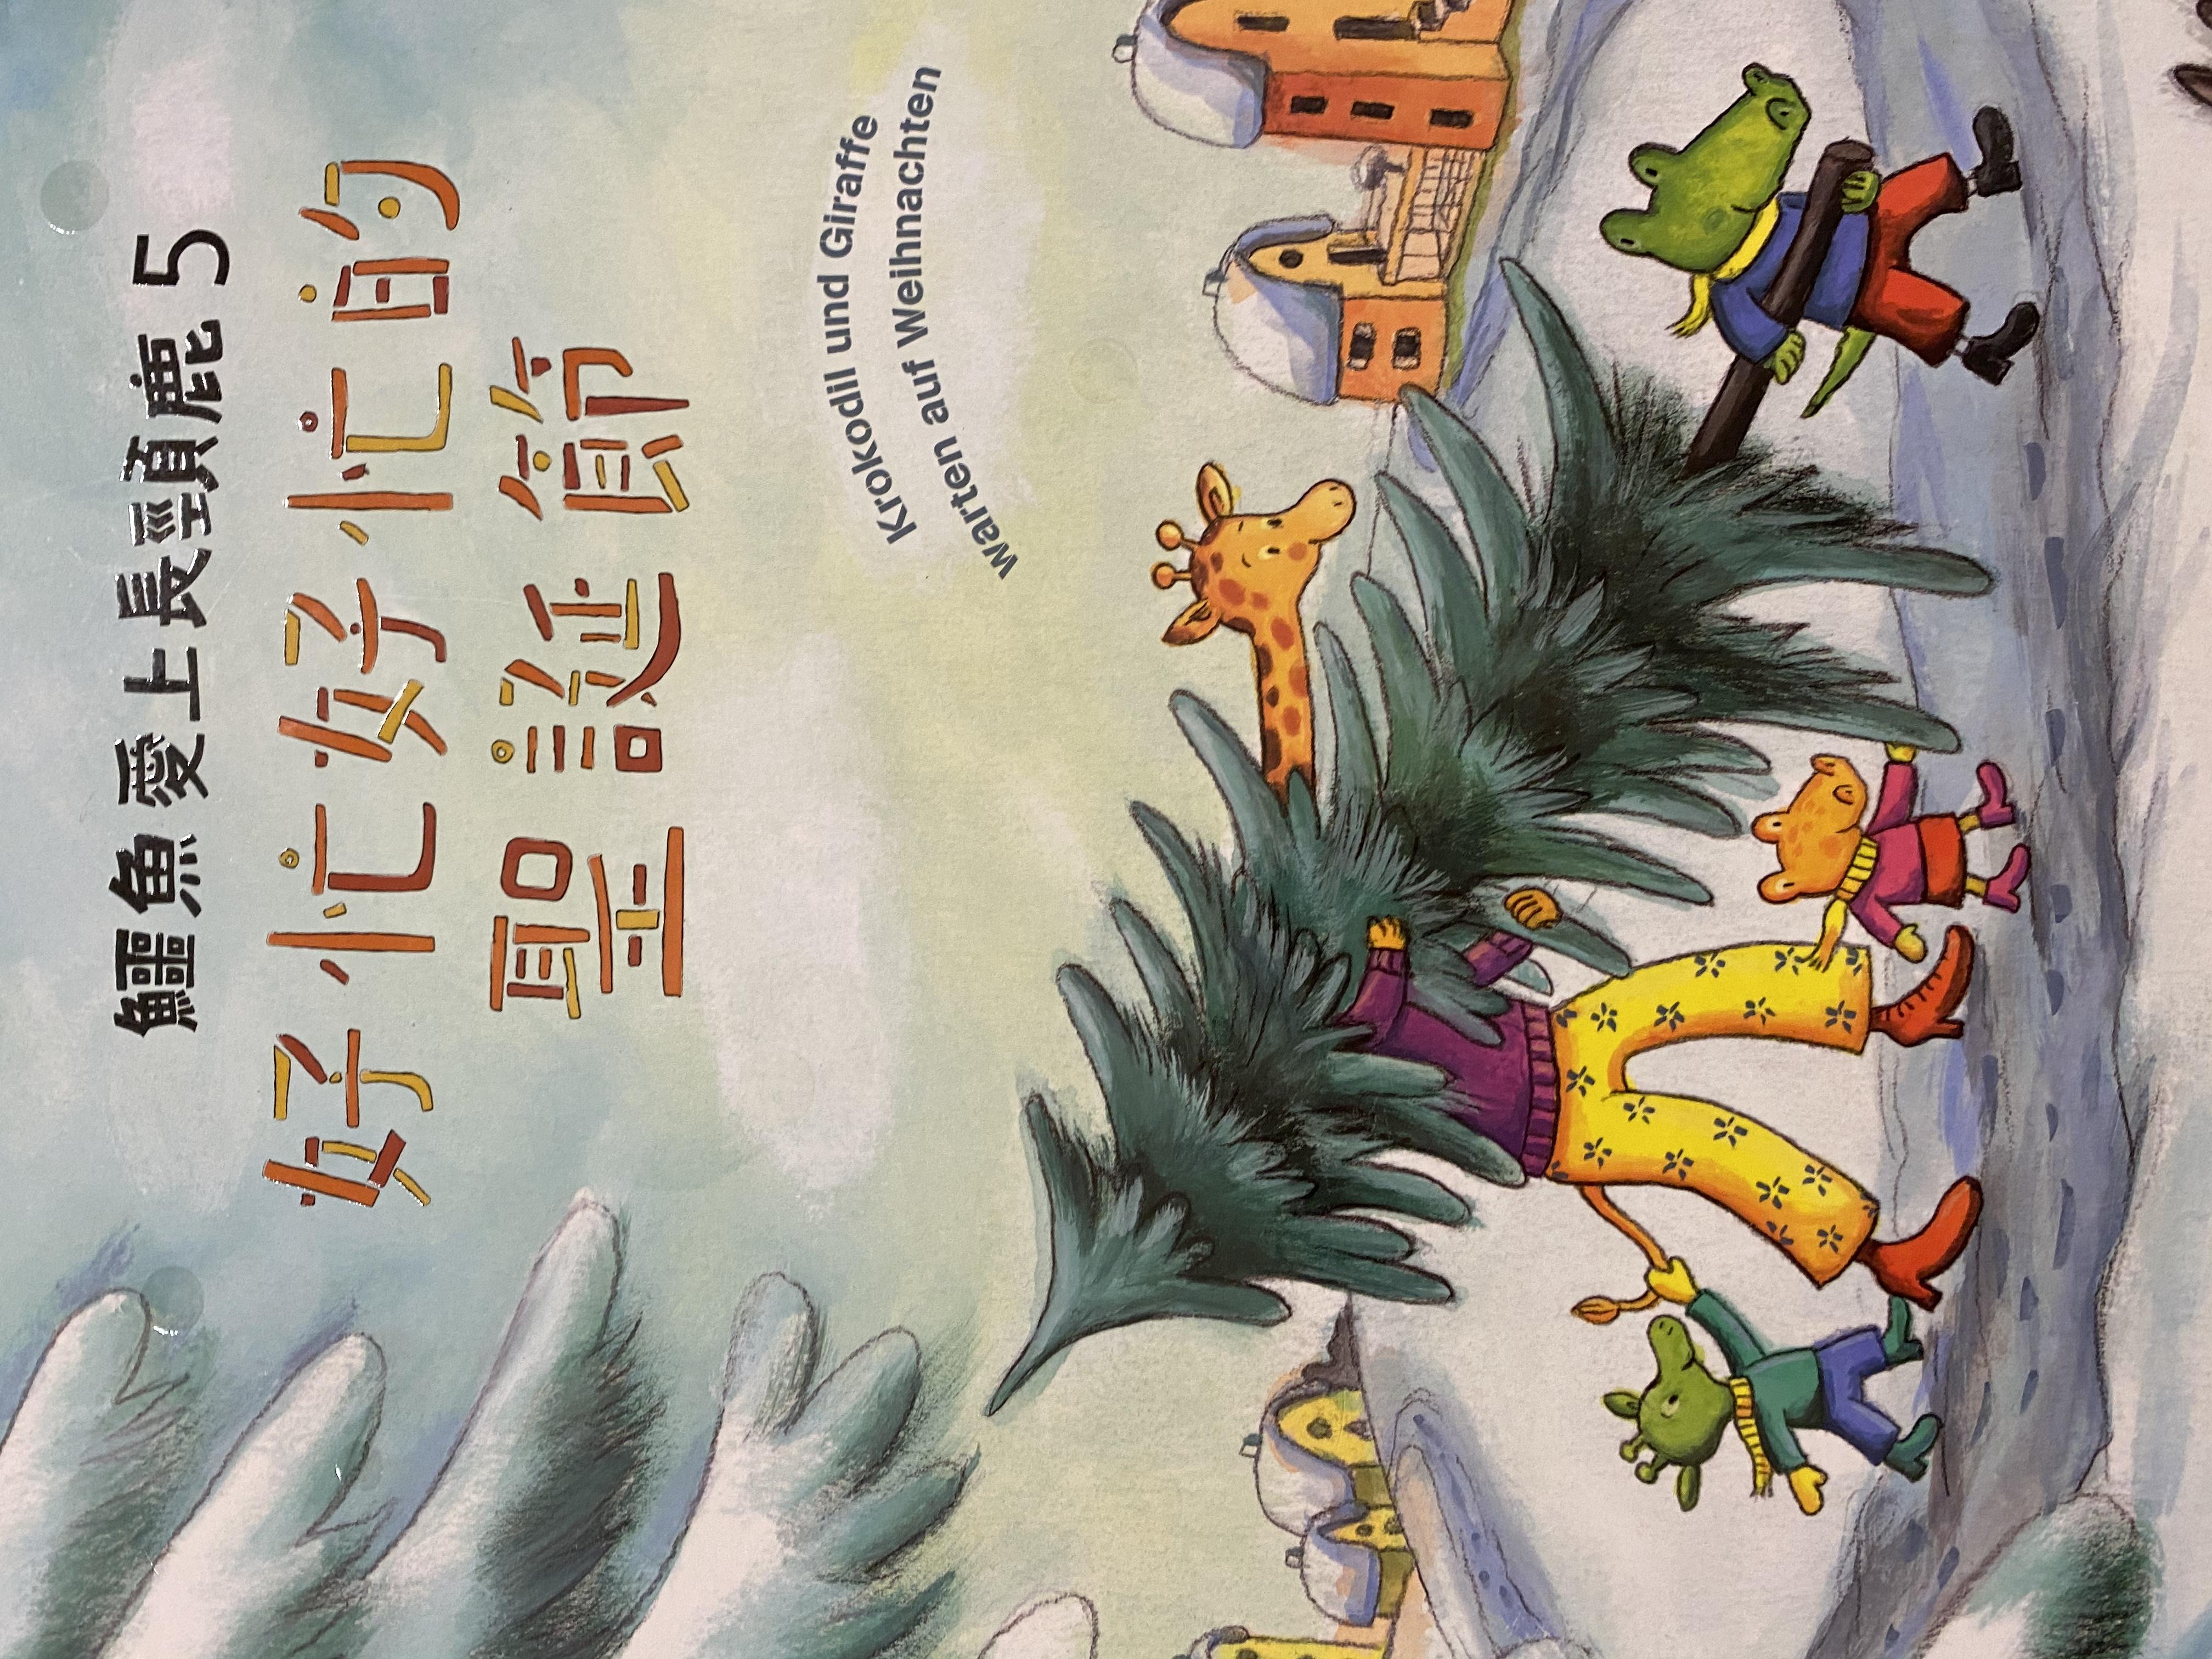 S3-028/ 好忙好忙的聖誕節/ 鱷魚愛上長頸鹿5/ 人際情感學習套組/文 達妮拉‧庫洛特/ 譯林硯芬/ 采實文化